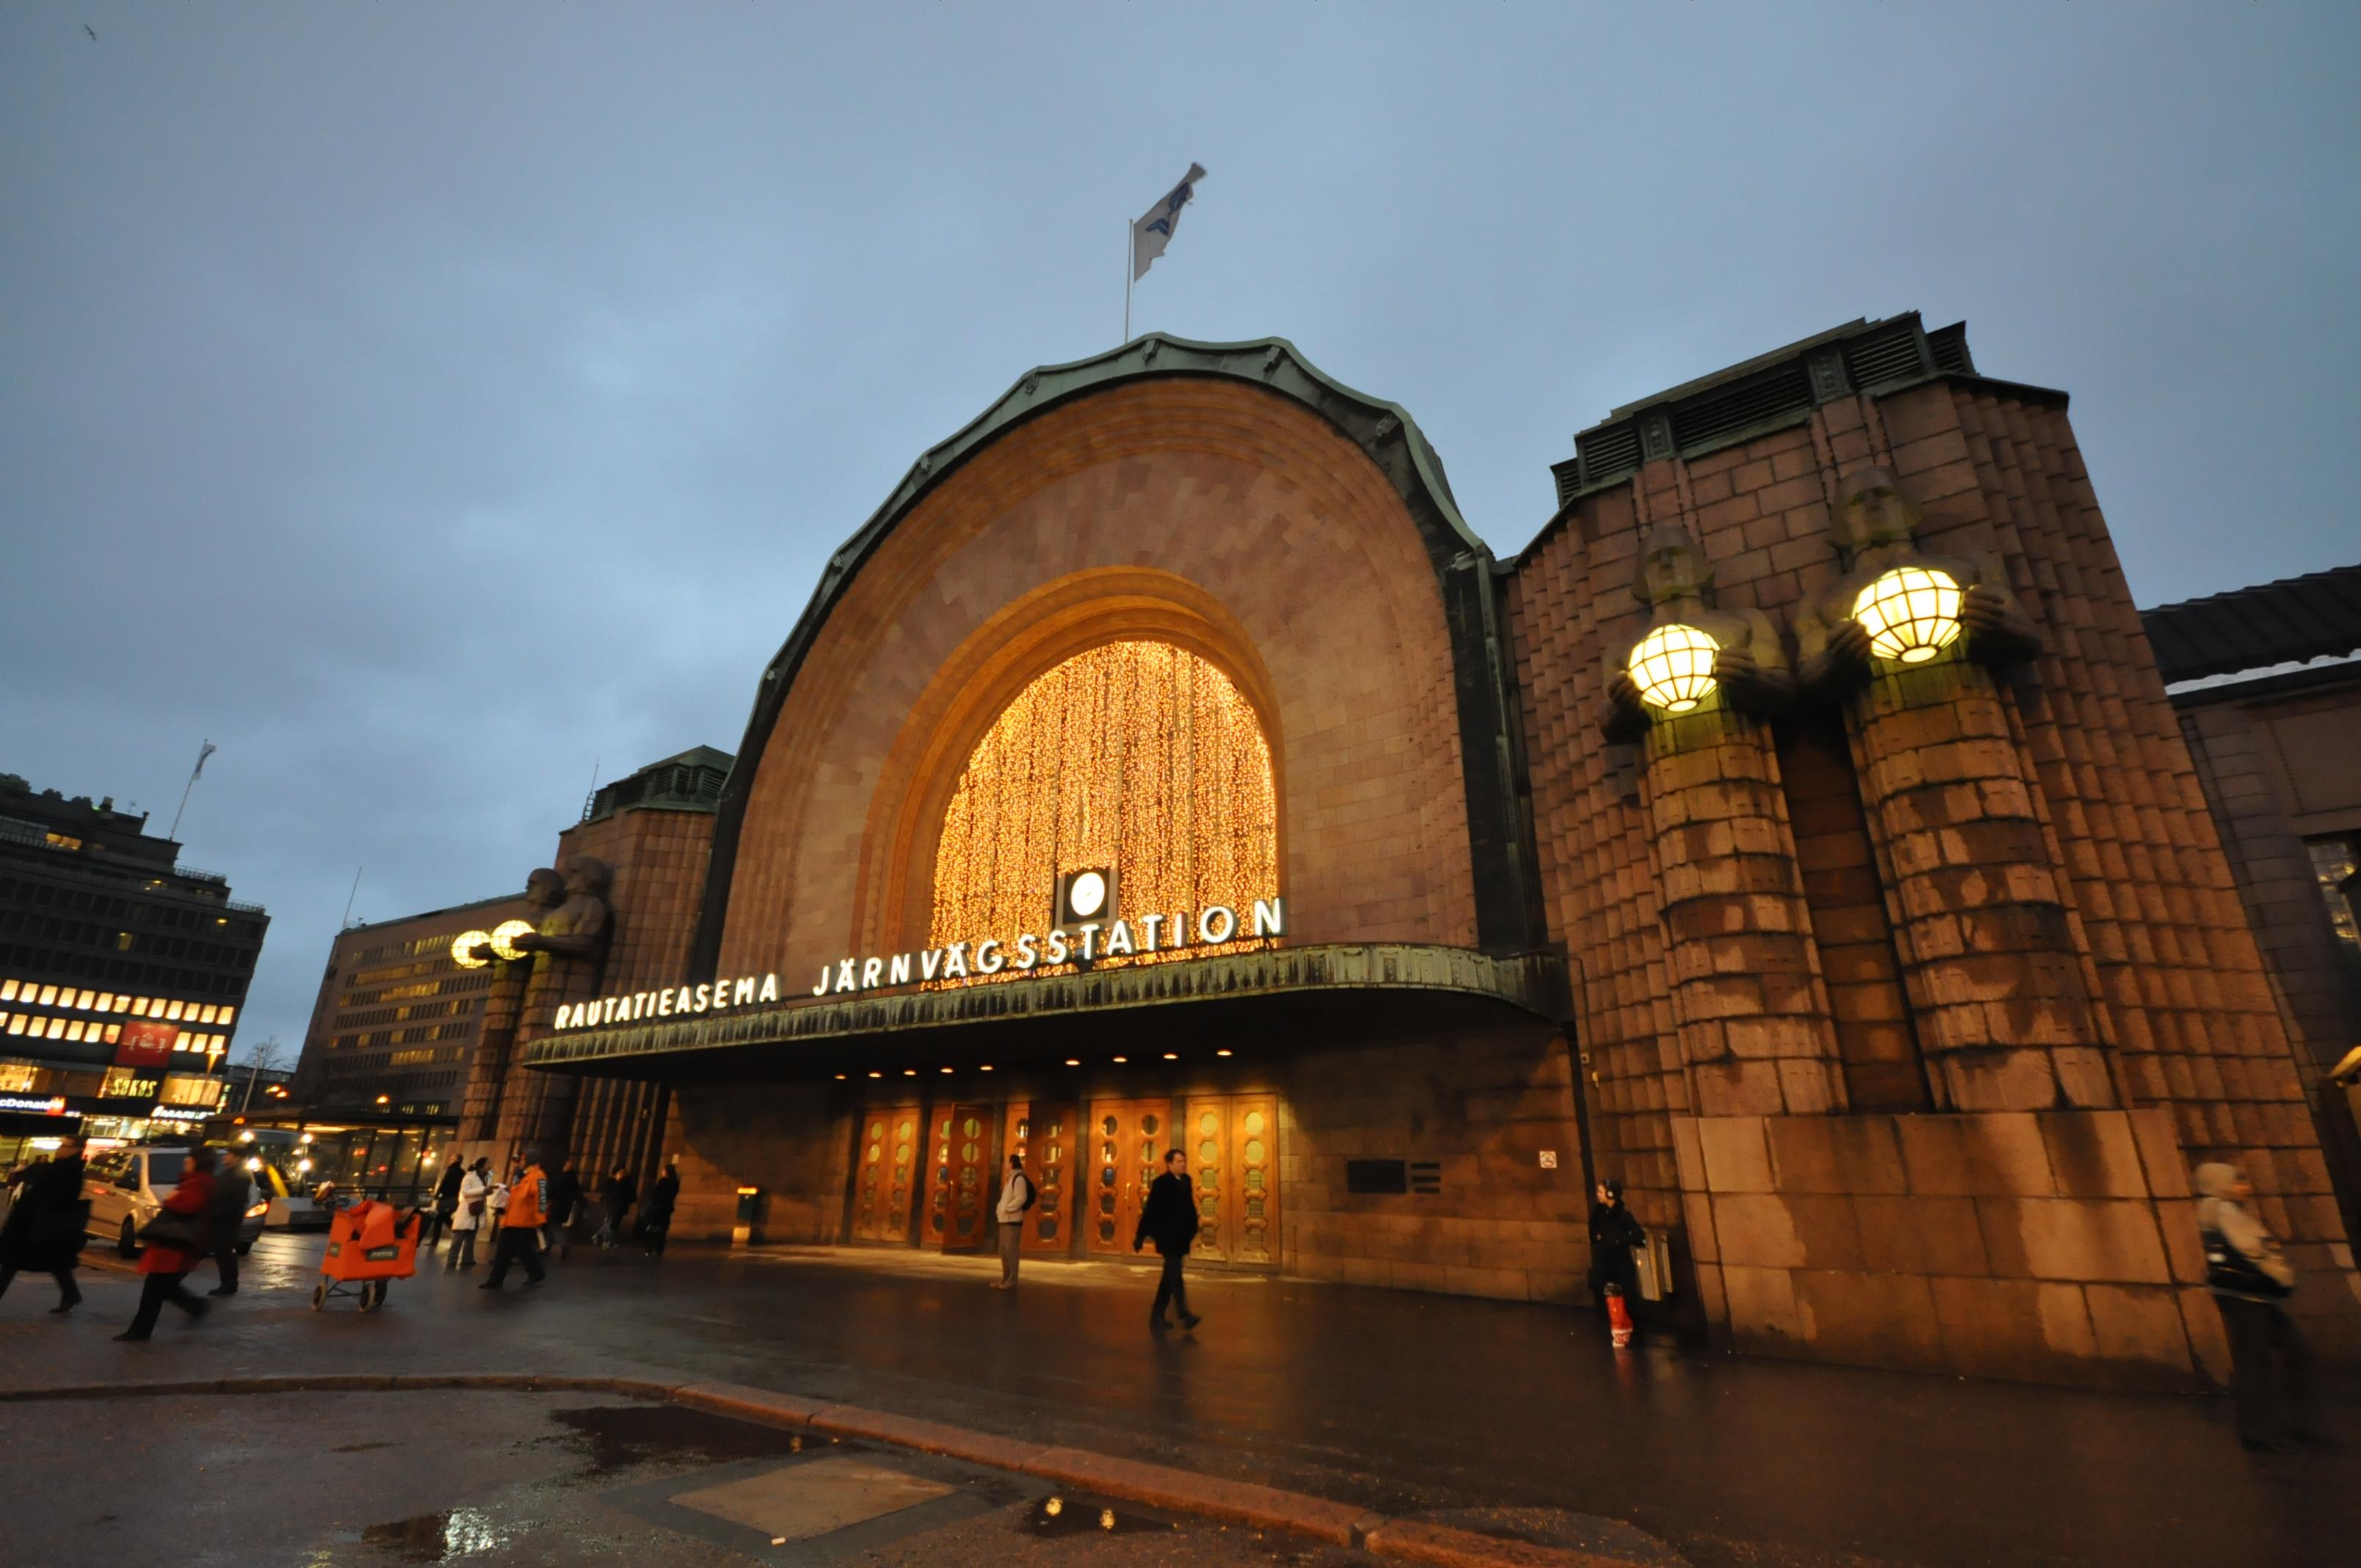 Helsingin Rautatieasema Liikkeet